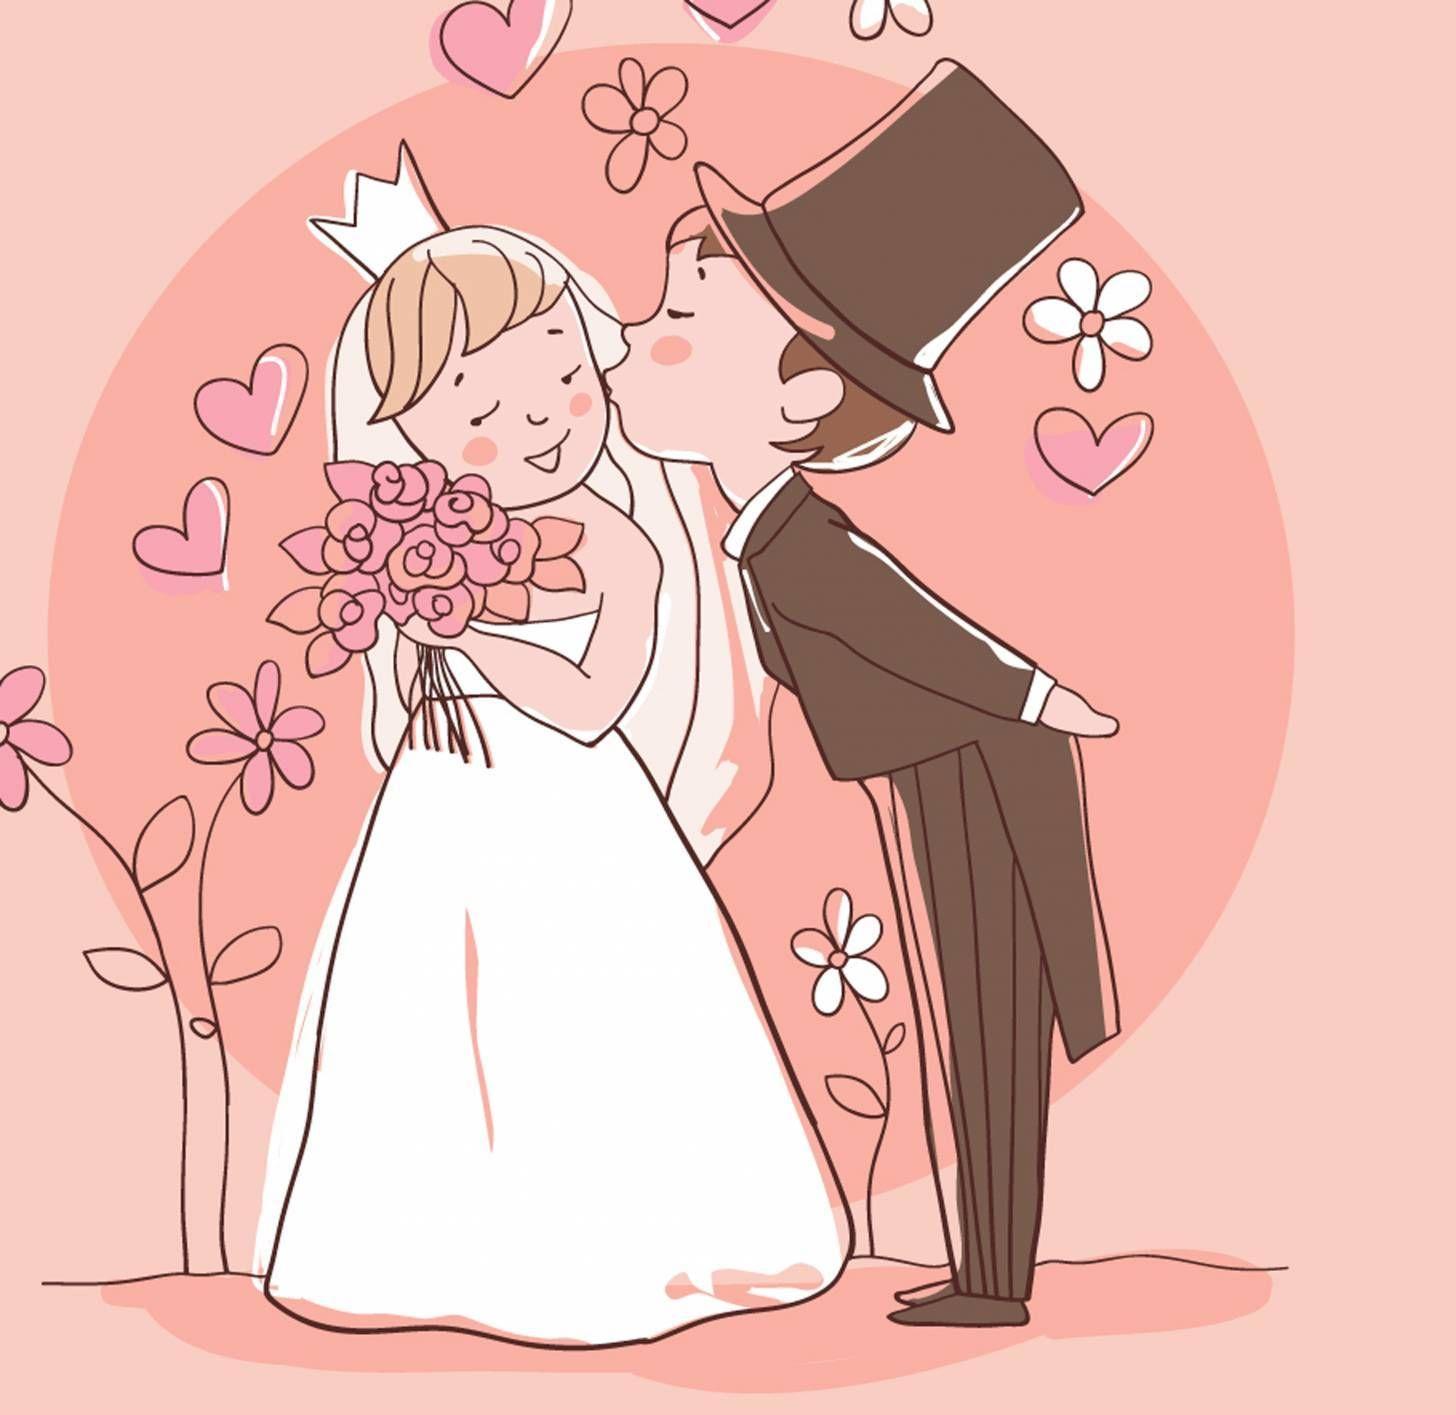 свадьба картинки открытки